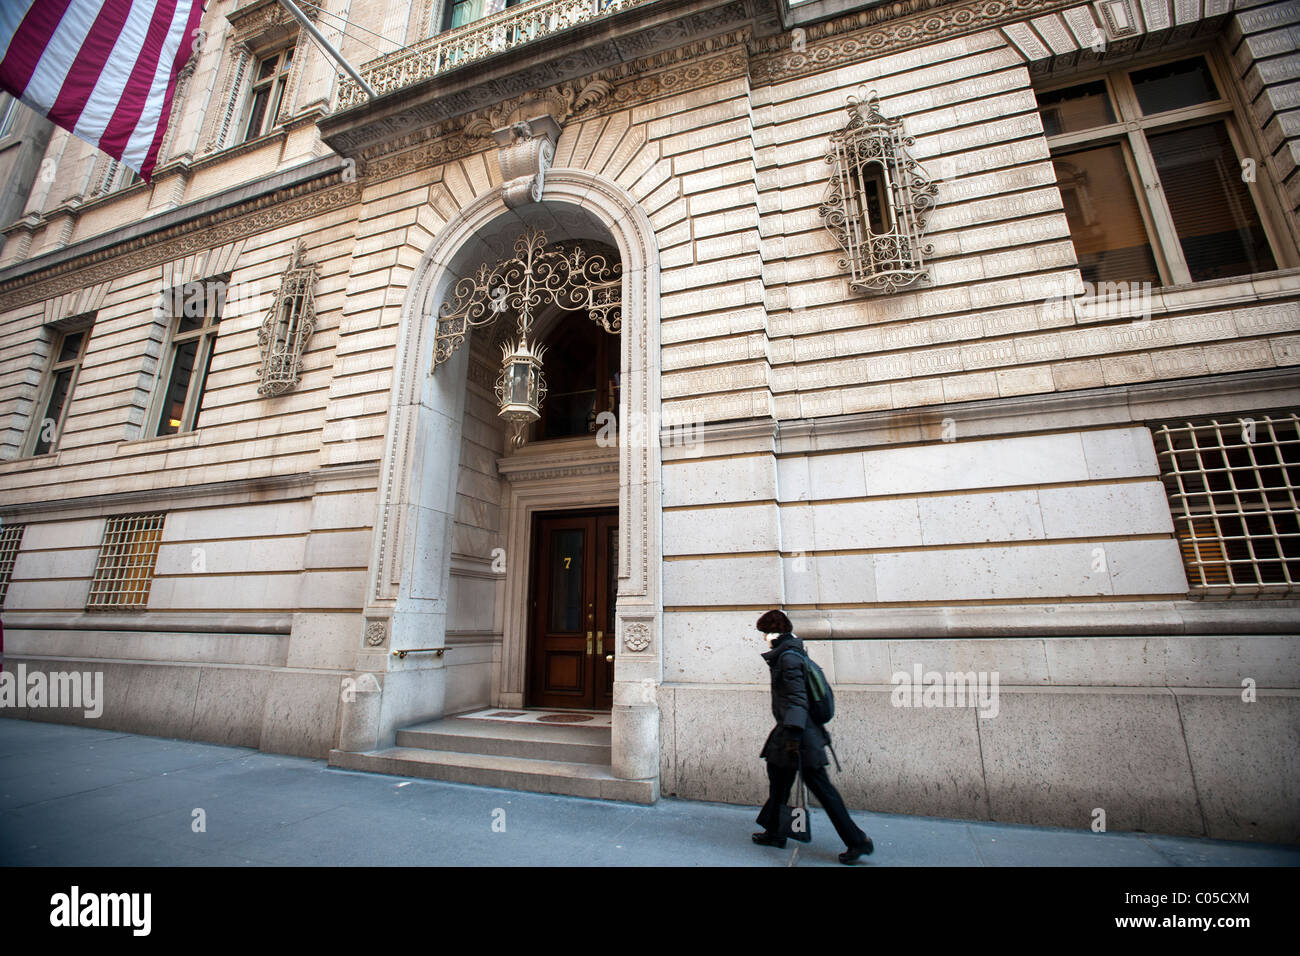 The Century Club in Midtown Manhattan - Stock Image